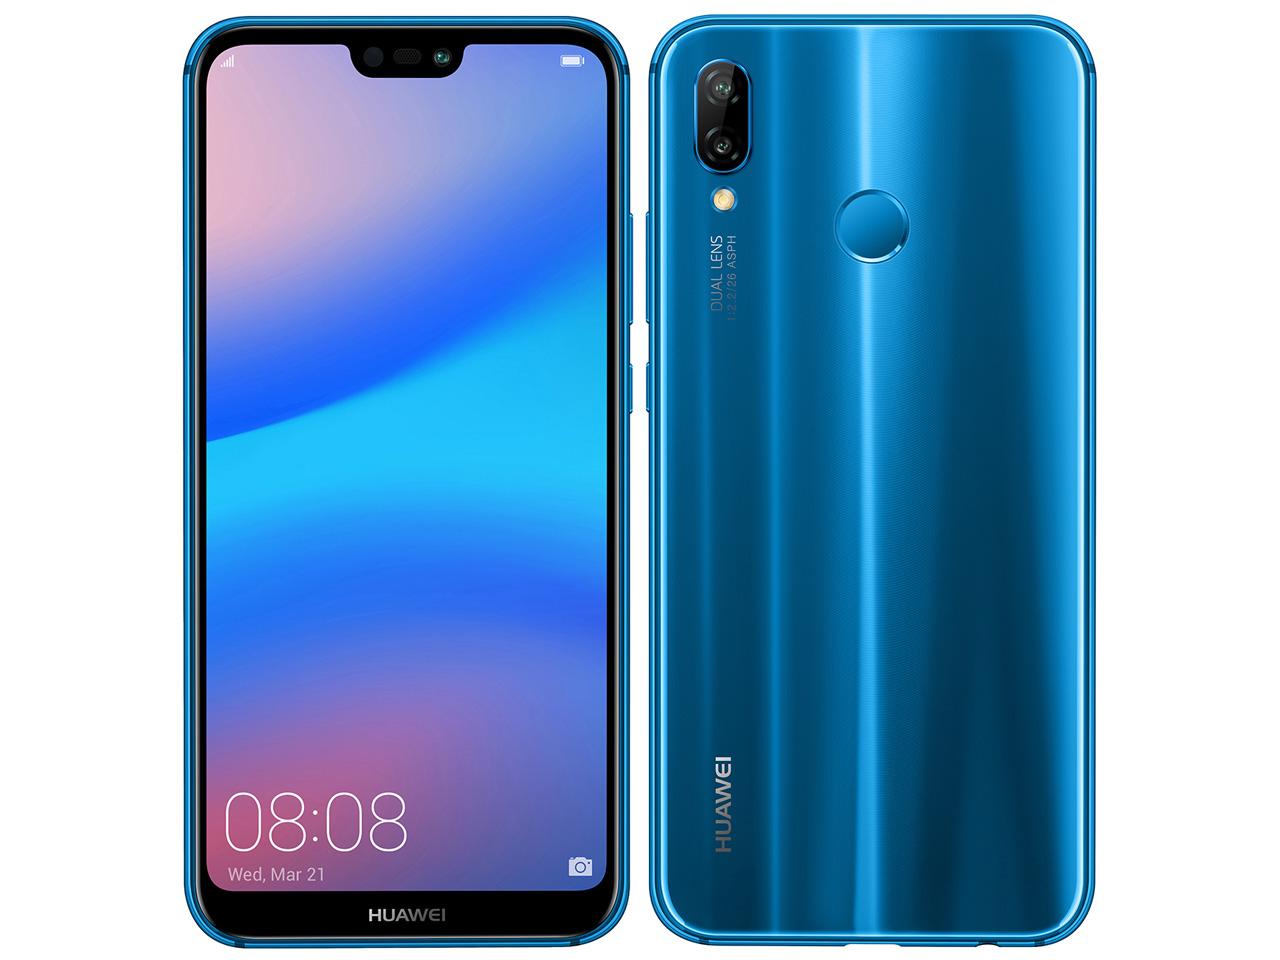 Yモバイル版 HUAWEI P20 lite [クラインブルー] SIMフリー 白ロム  JAN:4549046064639